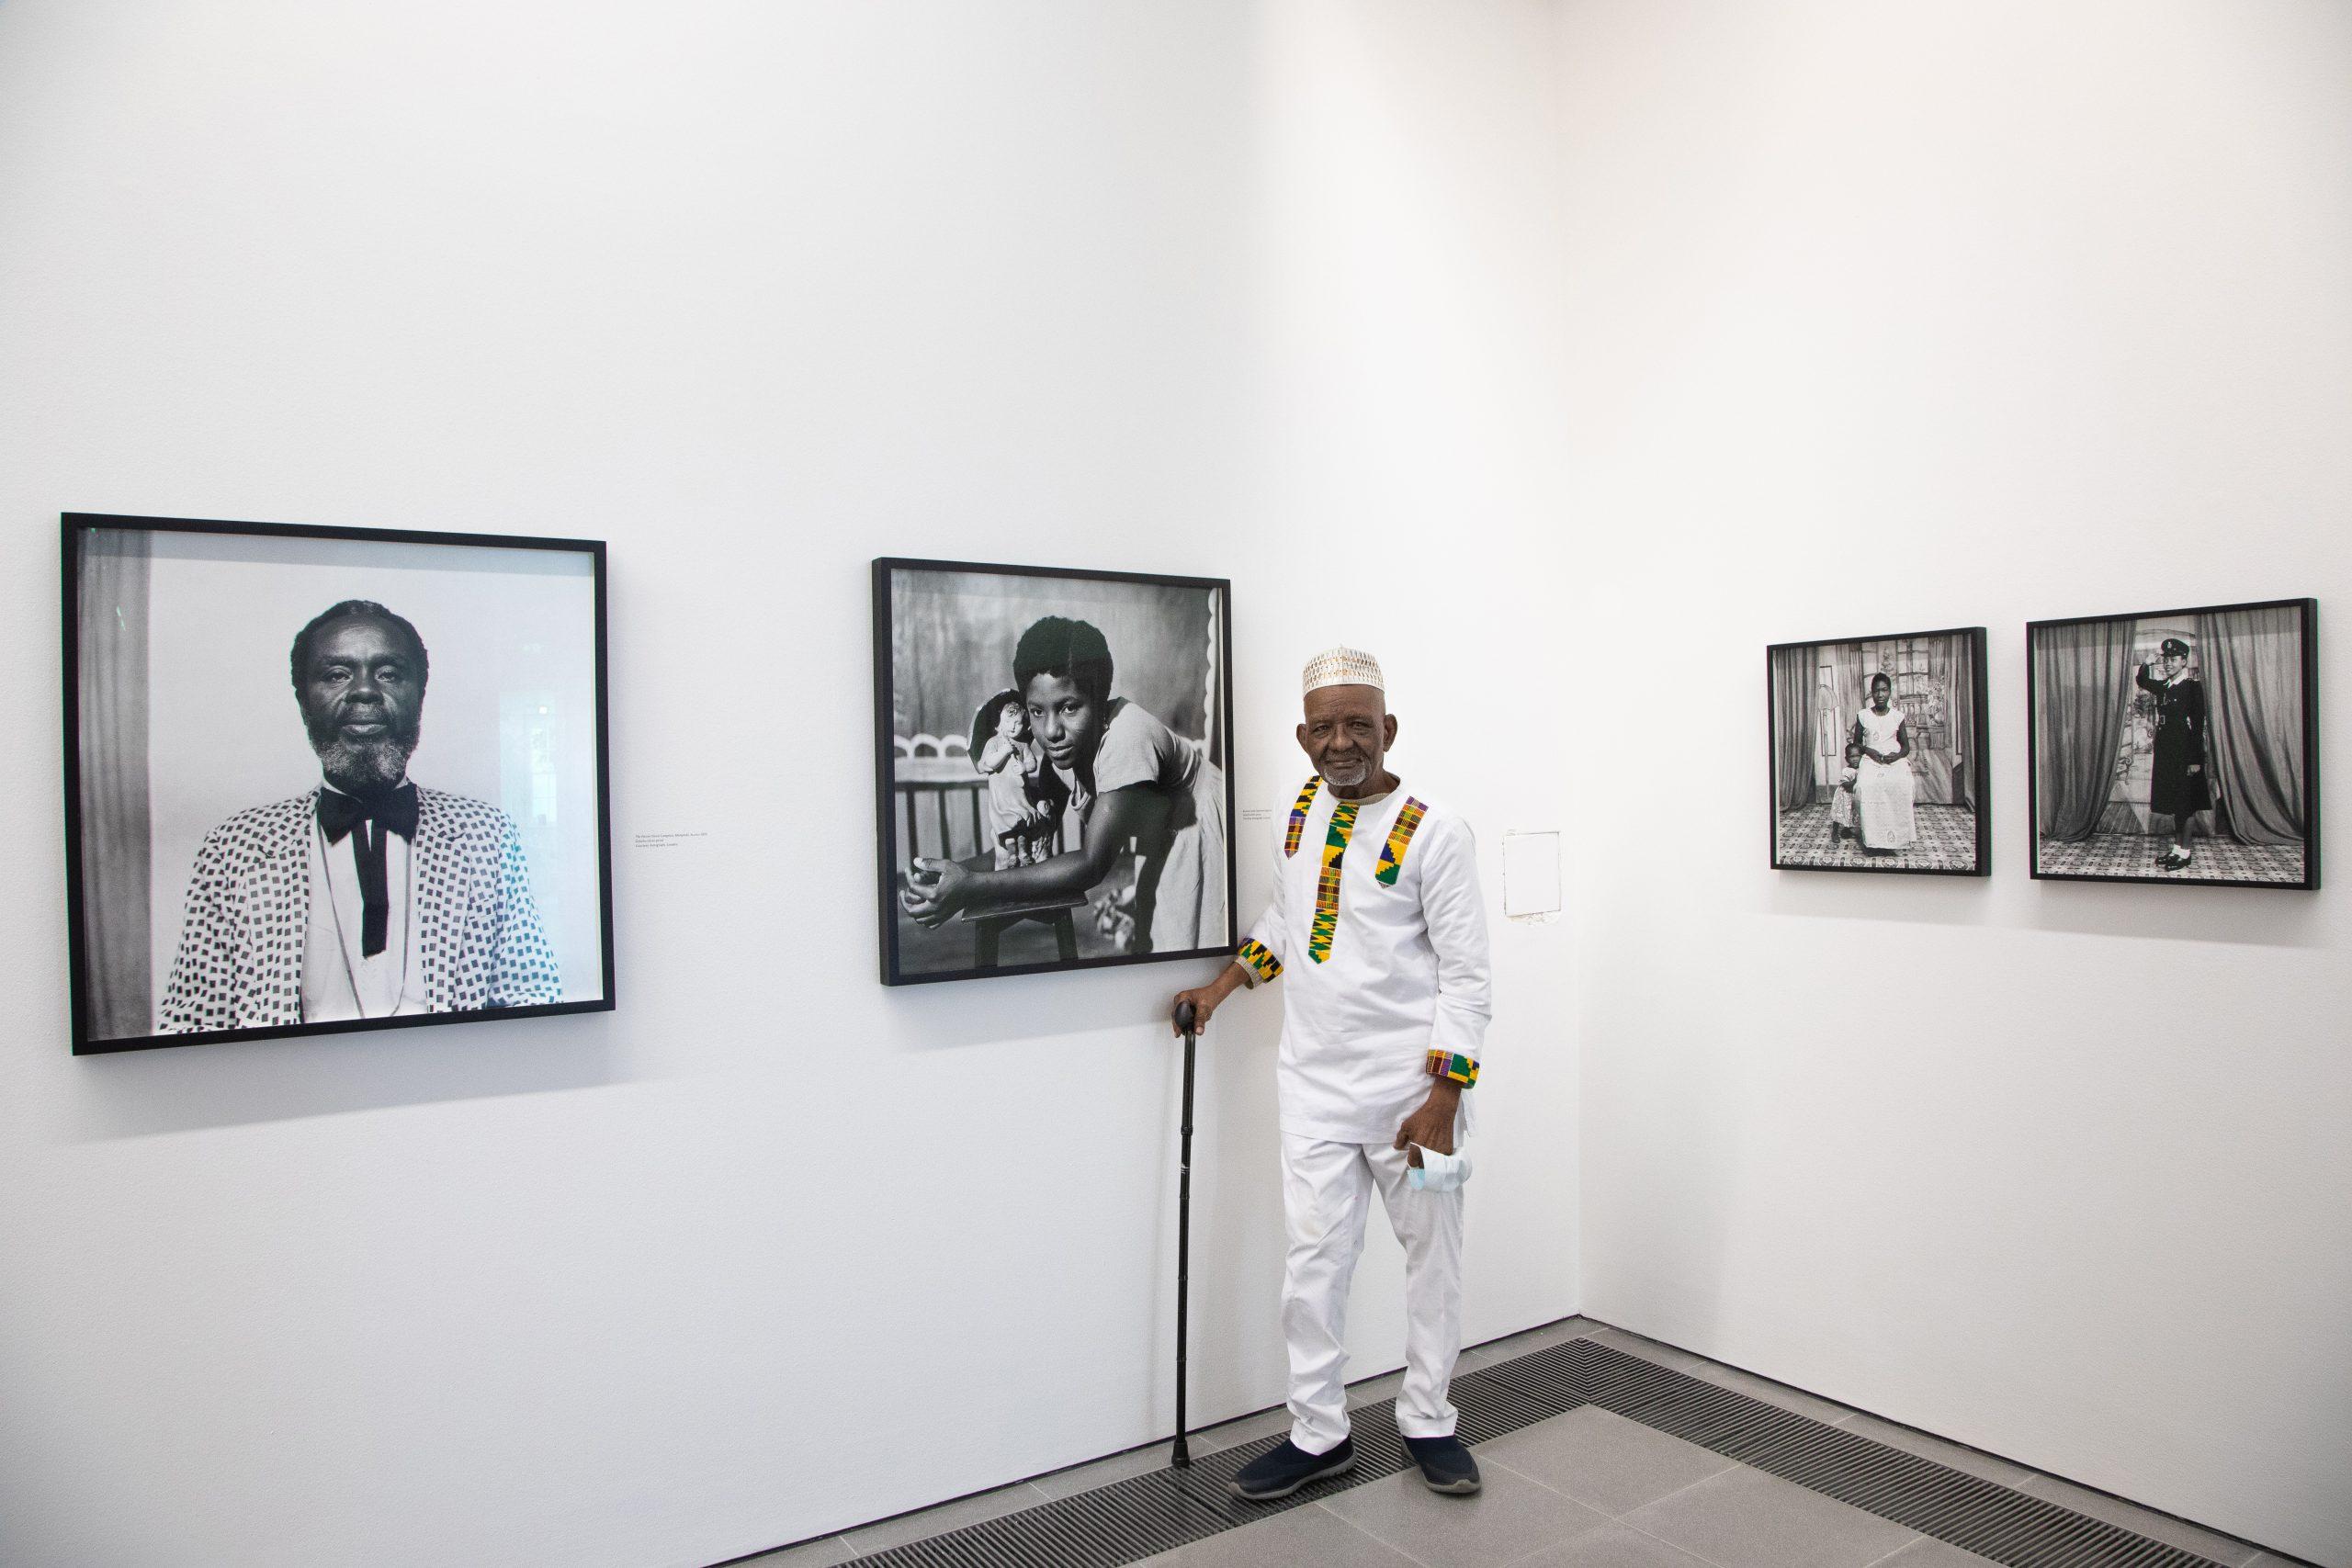 James Barnor: Accra/London - A Retrospective (Installation view, 19 May – 24 October 2021, Serpentine).